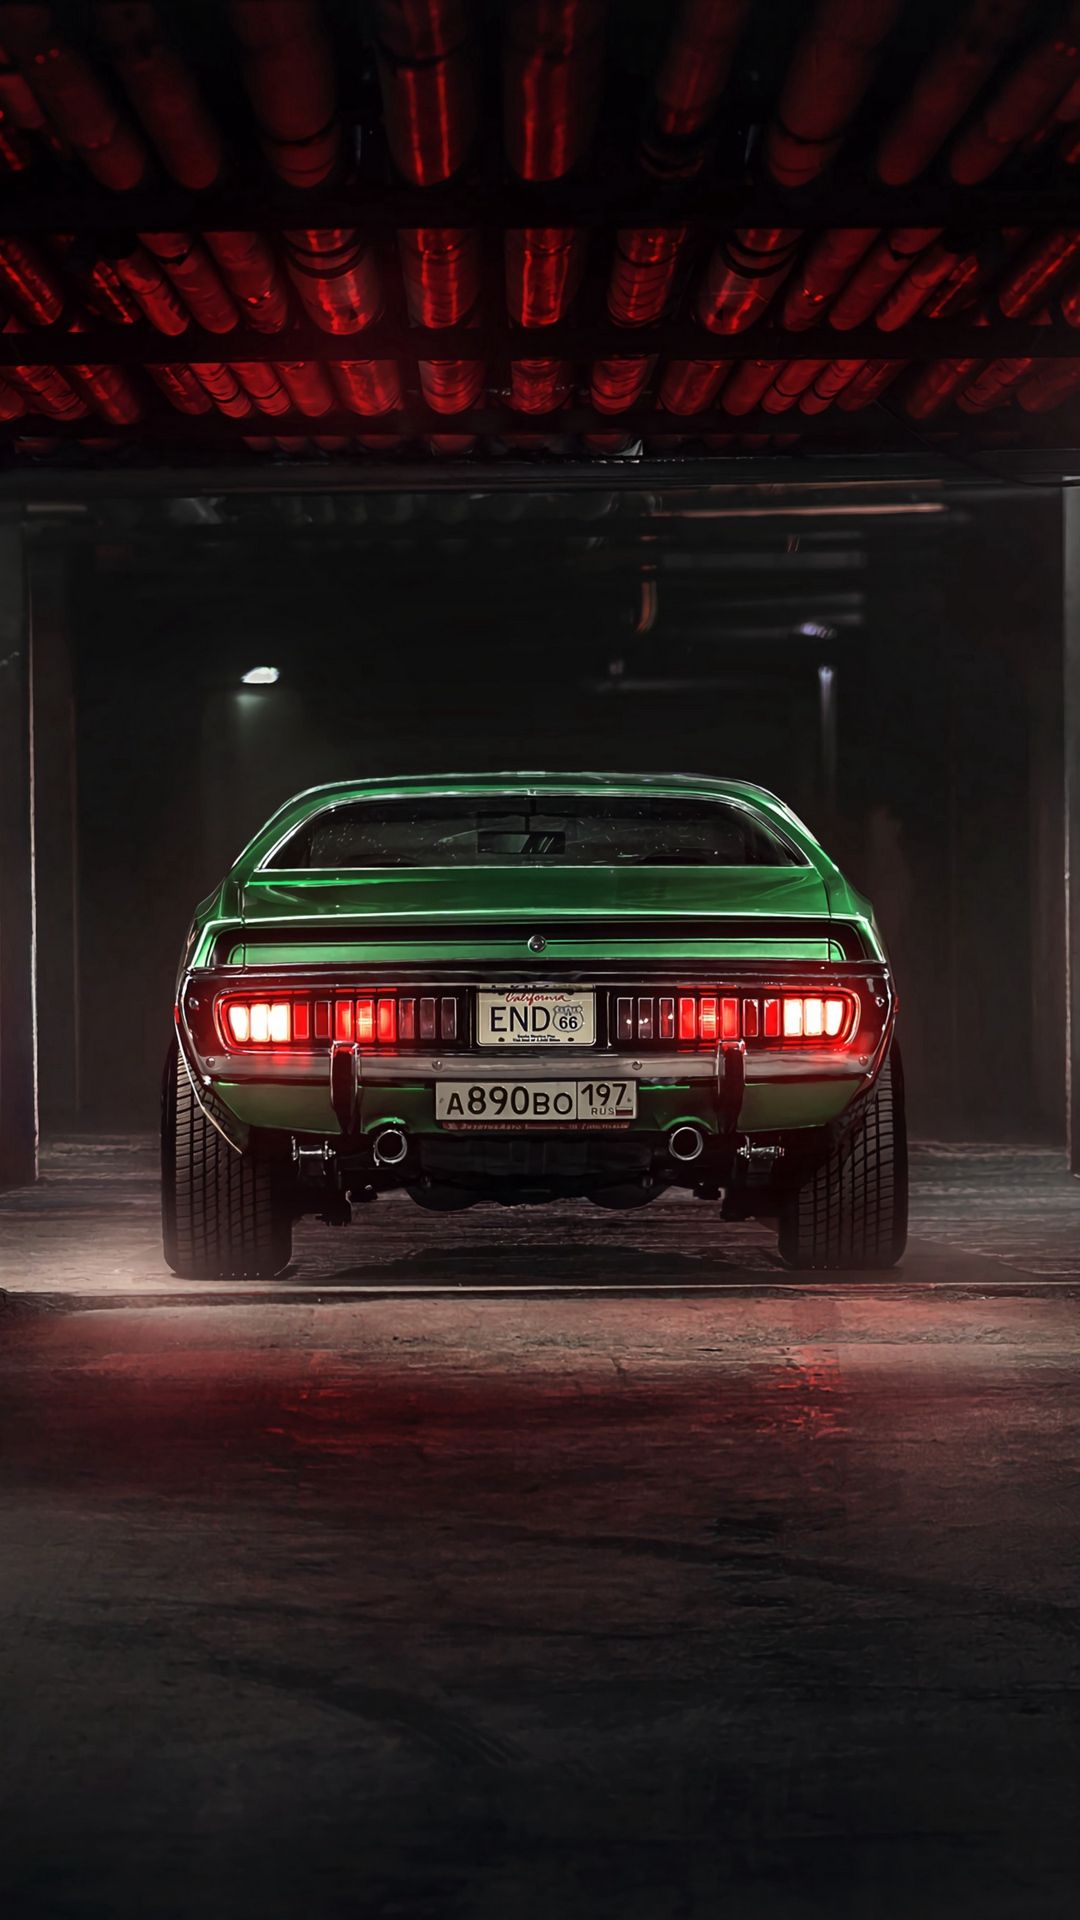 1080x1920 Wallpaper Car Garage Tuning Green Rear View Car Iphone Wallpaper Muscle Cars Bmw Wallpapers